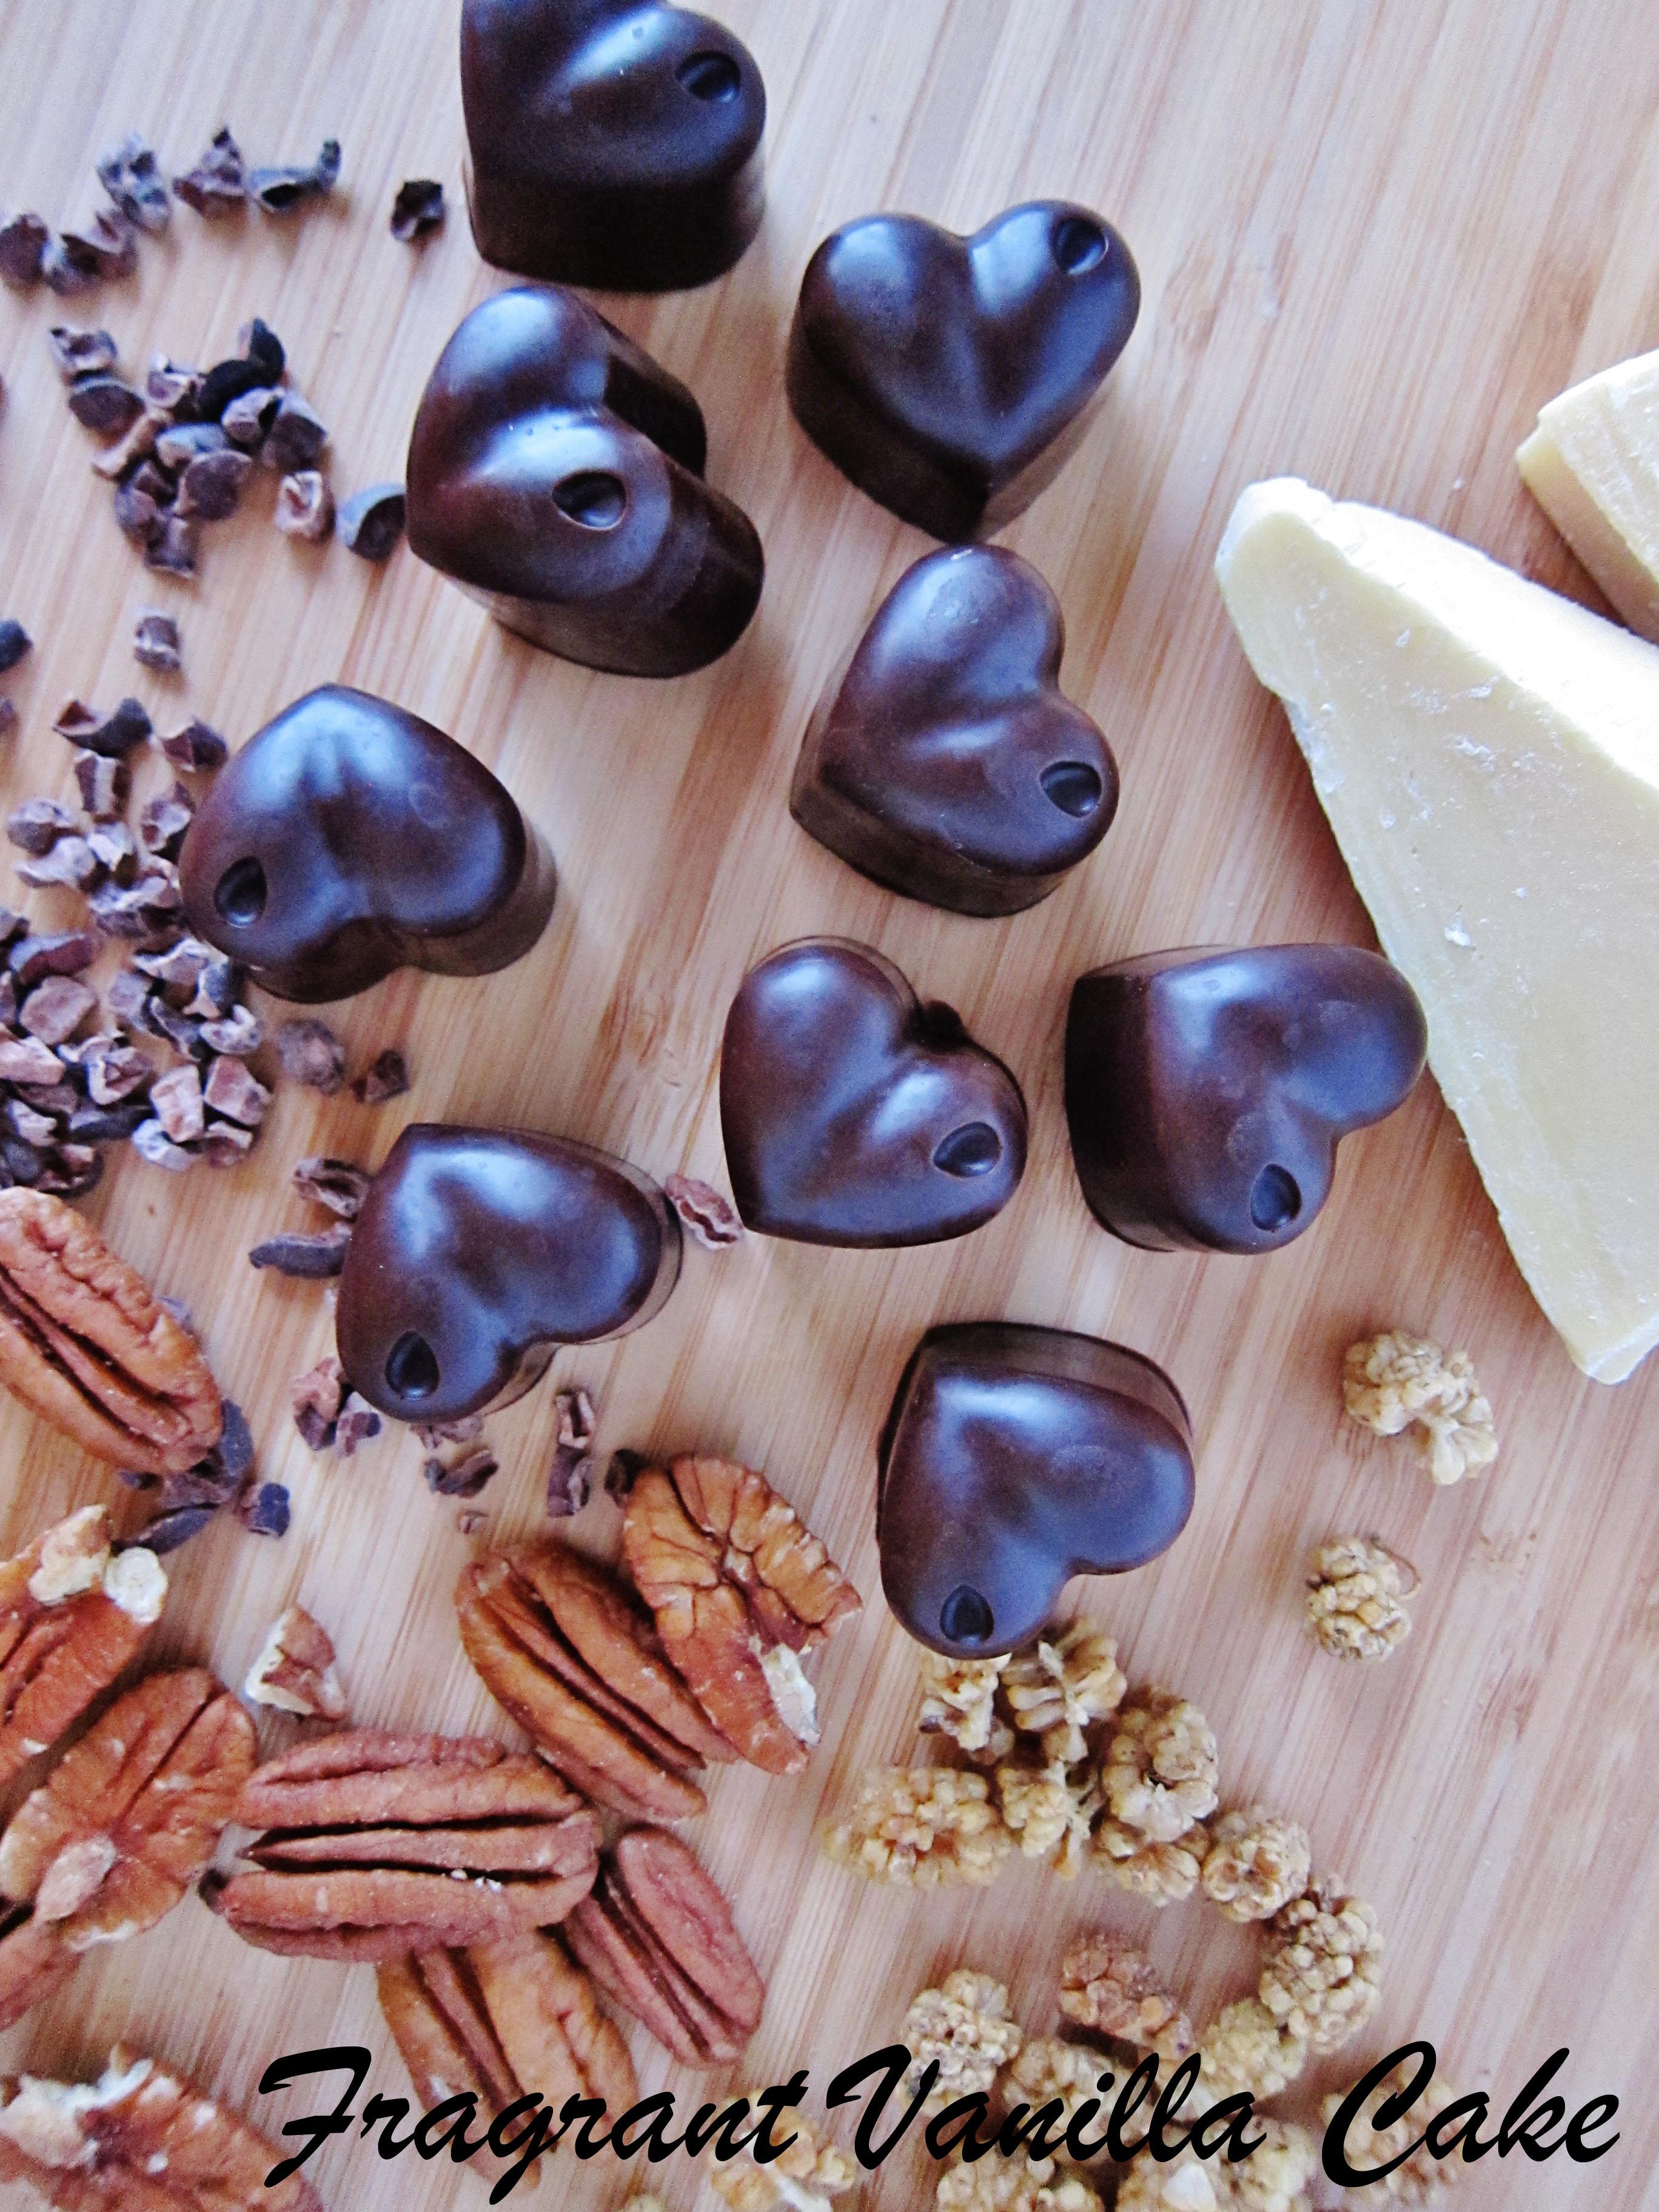 Mulberry Pecan Crunch Dark Chocolates